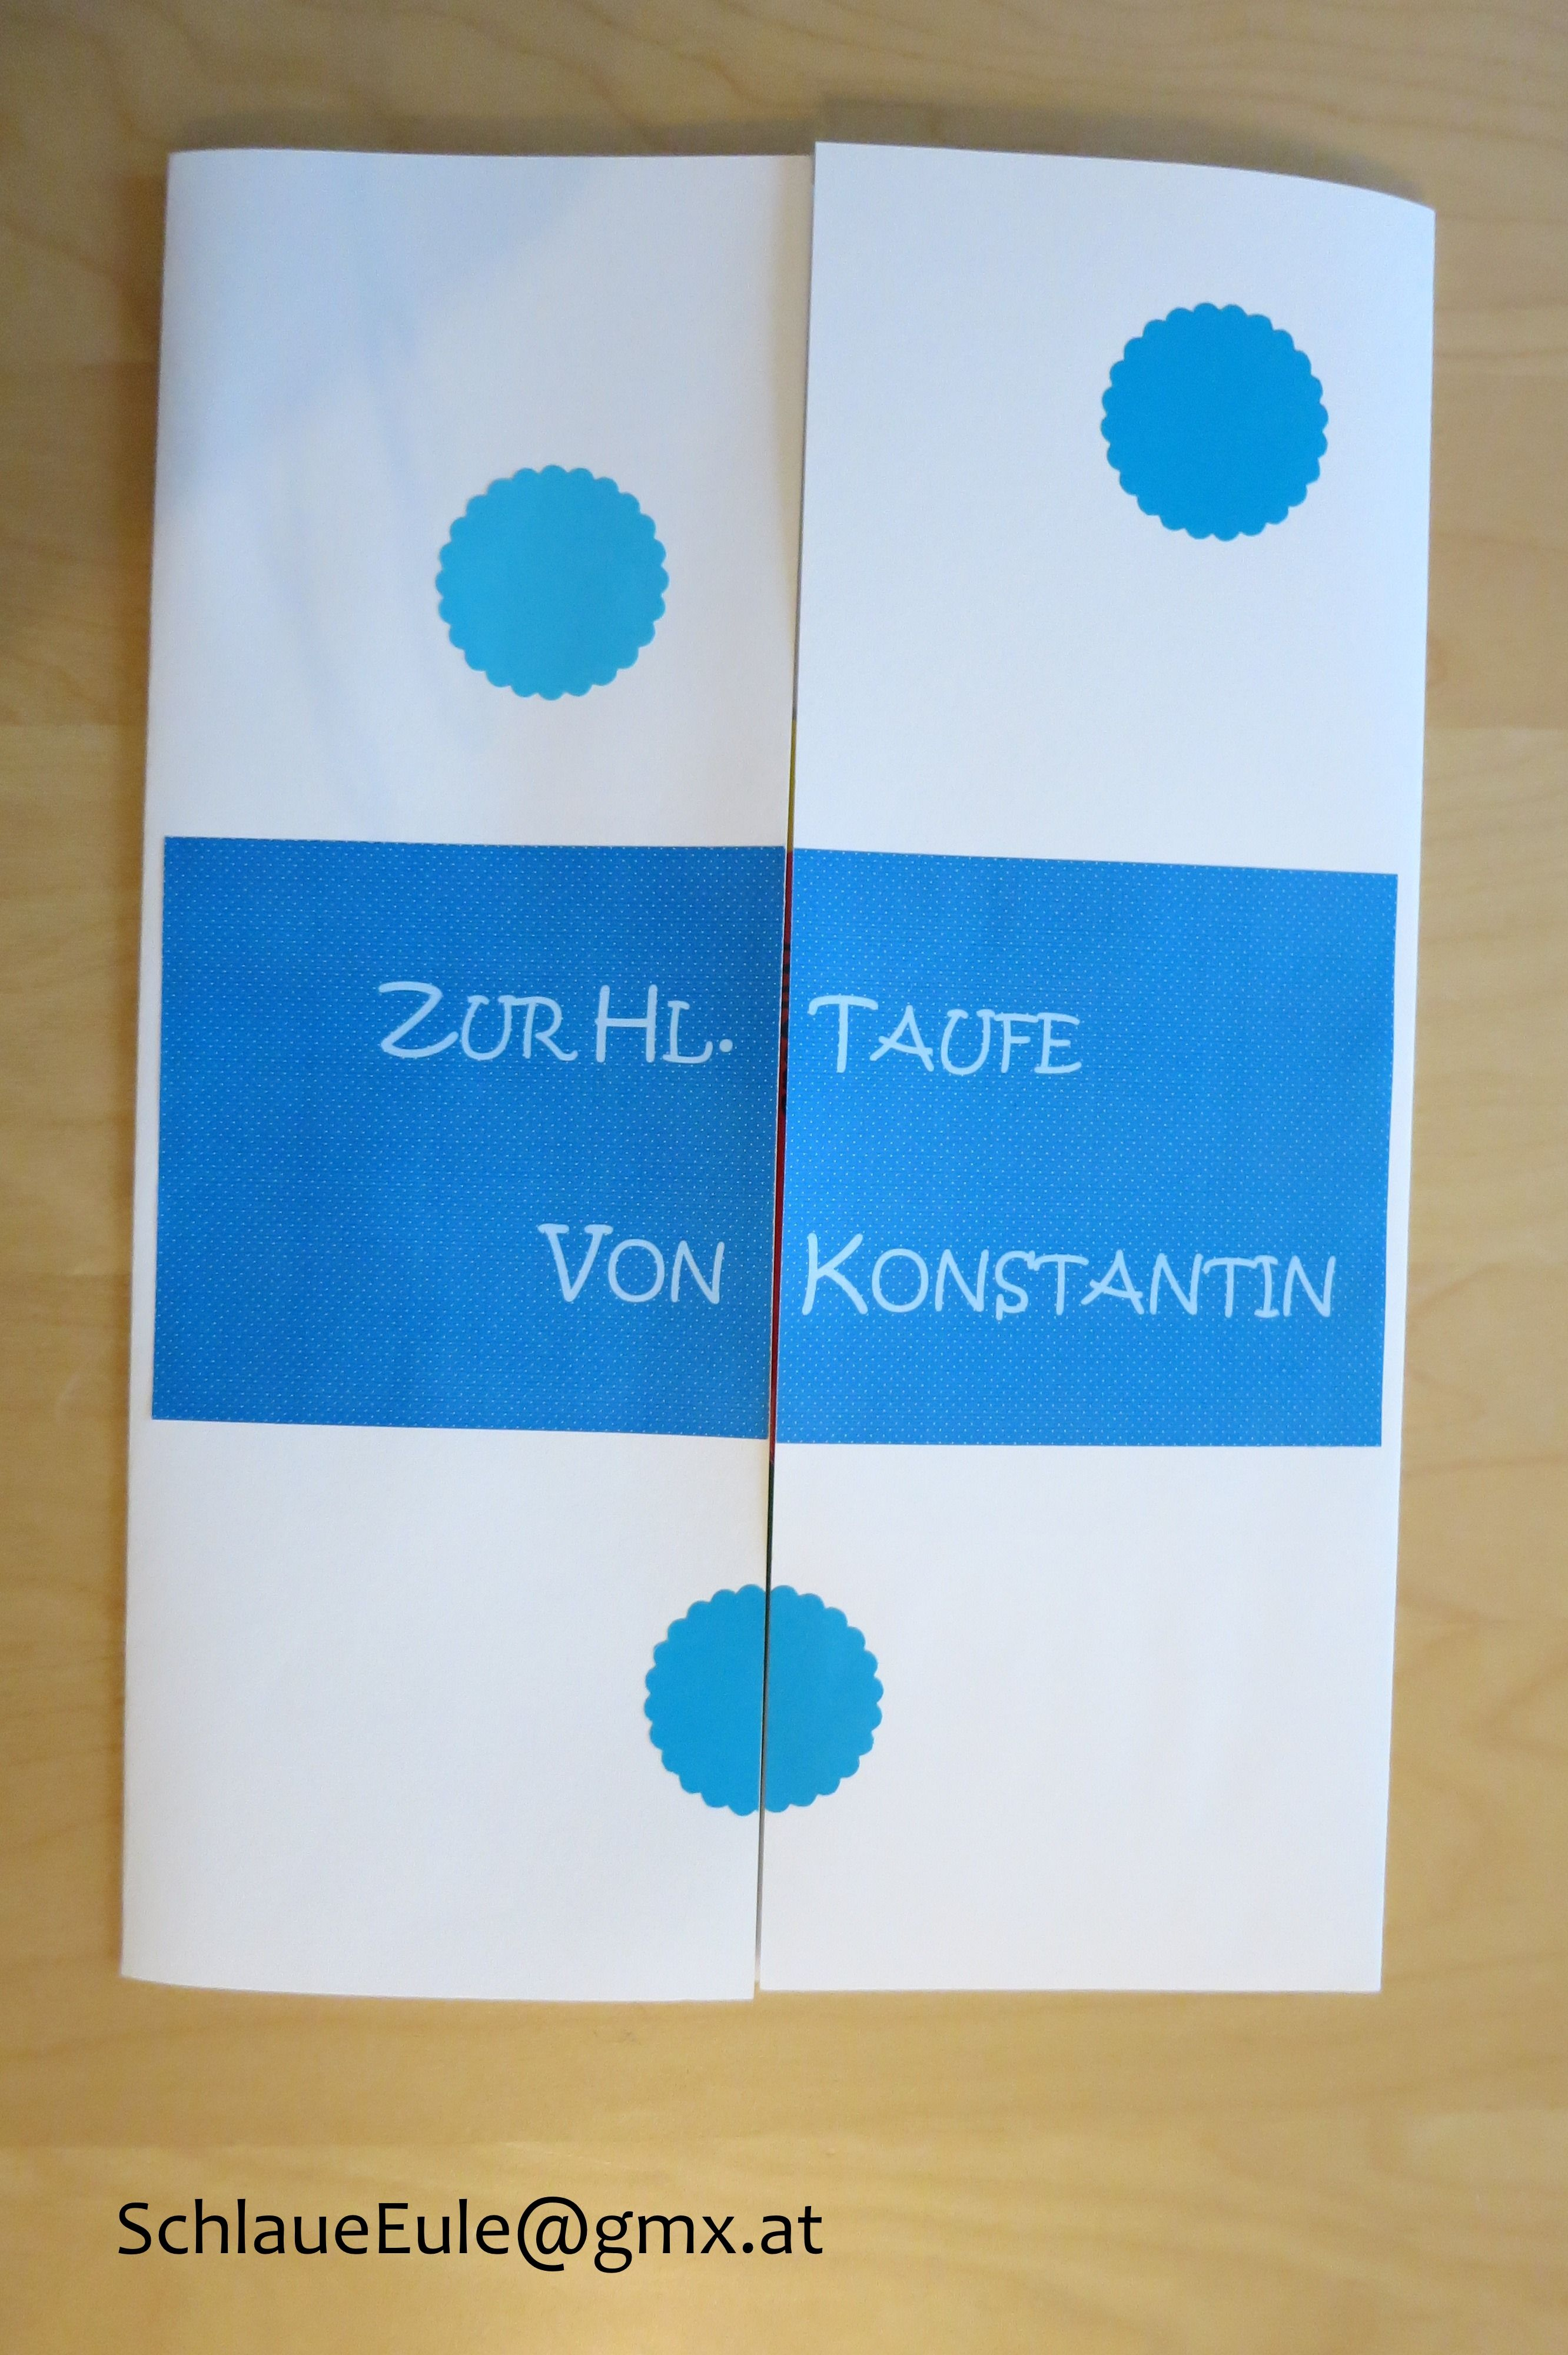 Taufe Lapbook Deckblatt Version 2 | Taufe & Lapbook | Pinterest ...